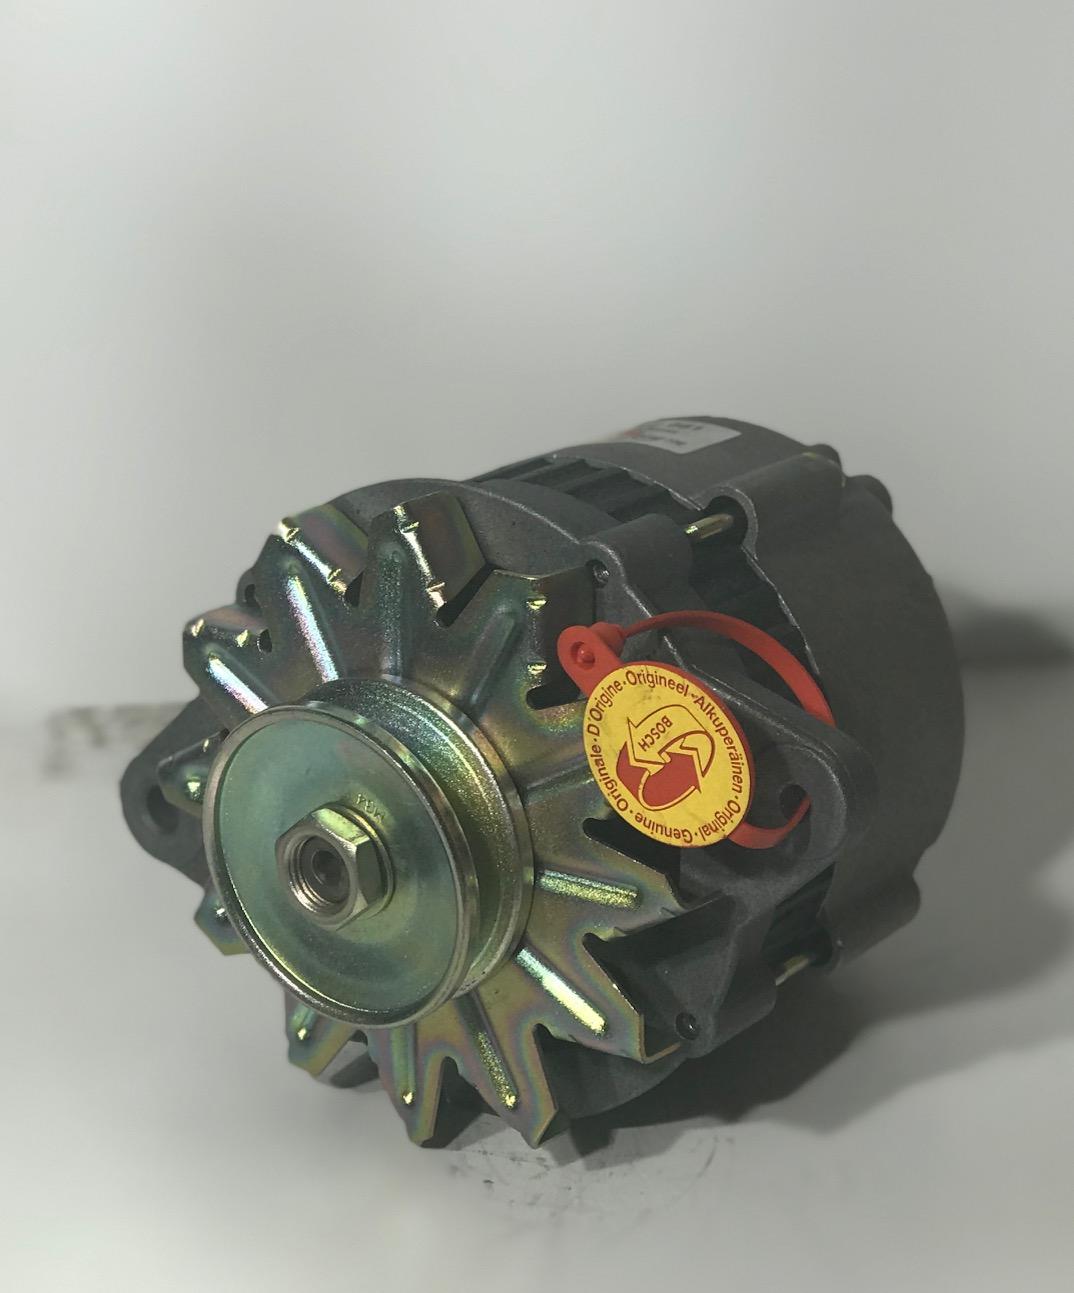 Hitachi Lichtmaschine 0986032661 LR160-121 14V Alternateur Alternator Generator